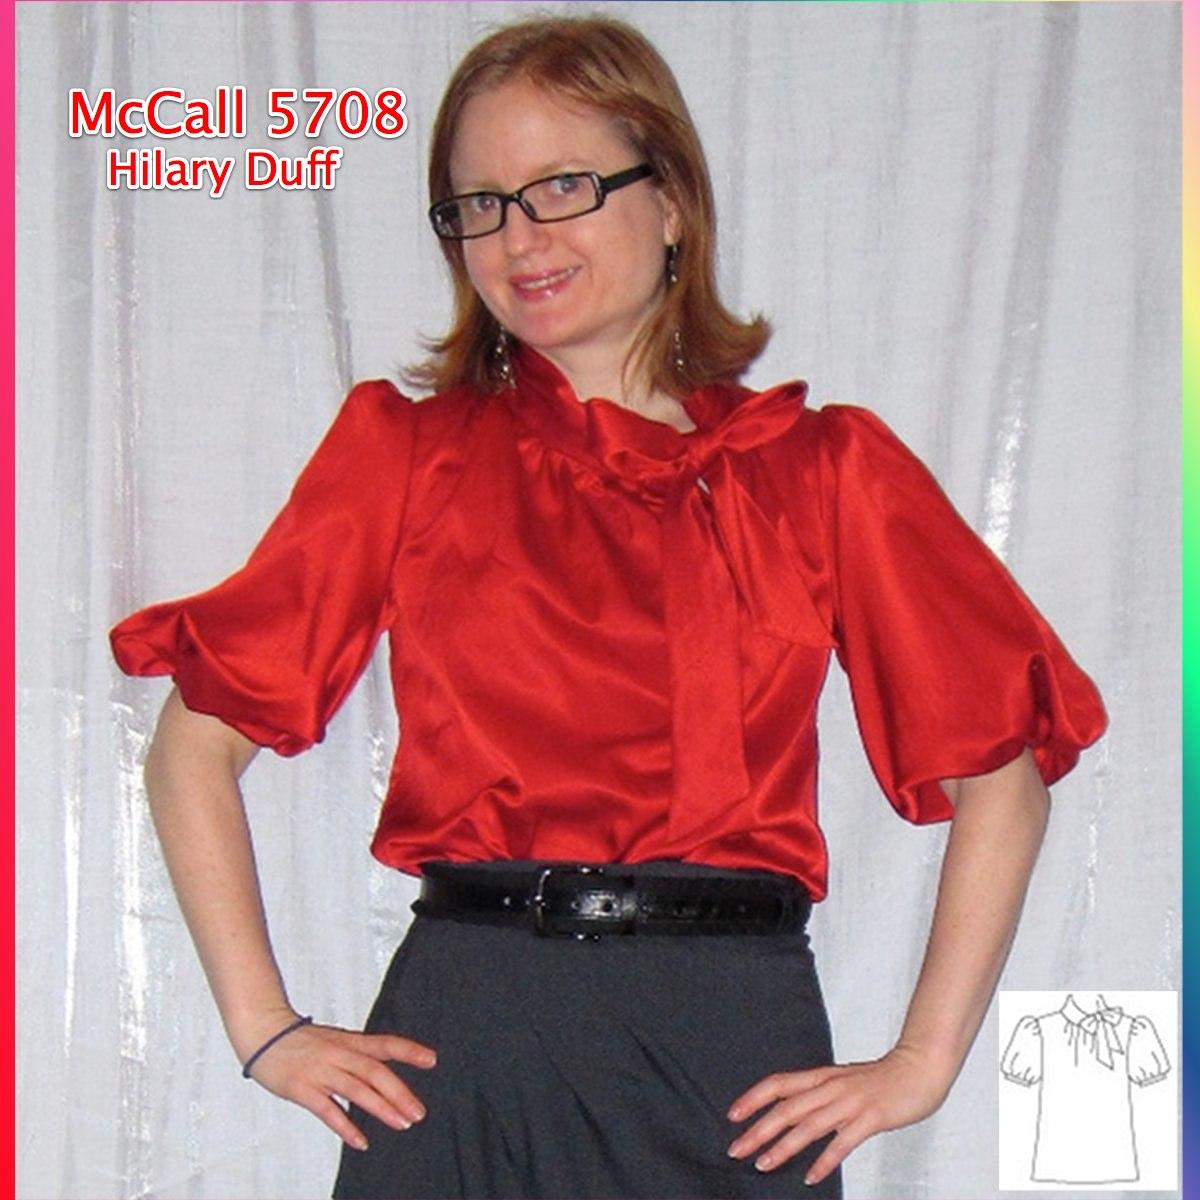 McCall 5708 Thumbnail